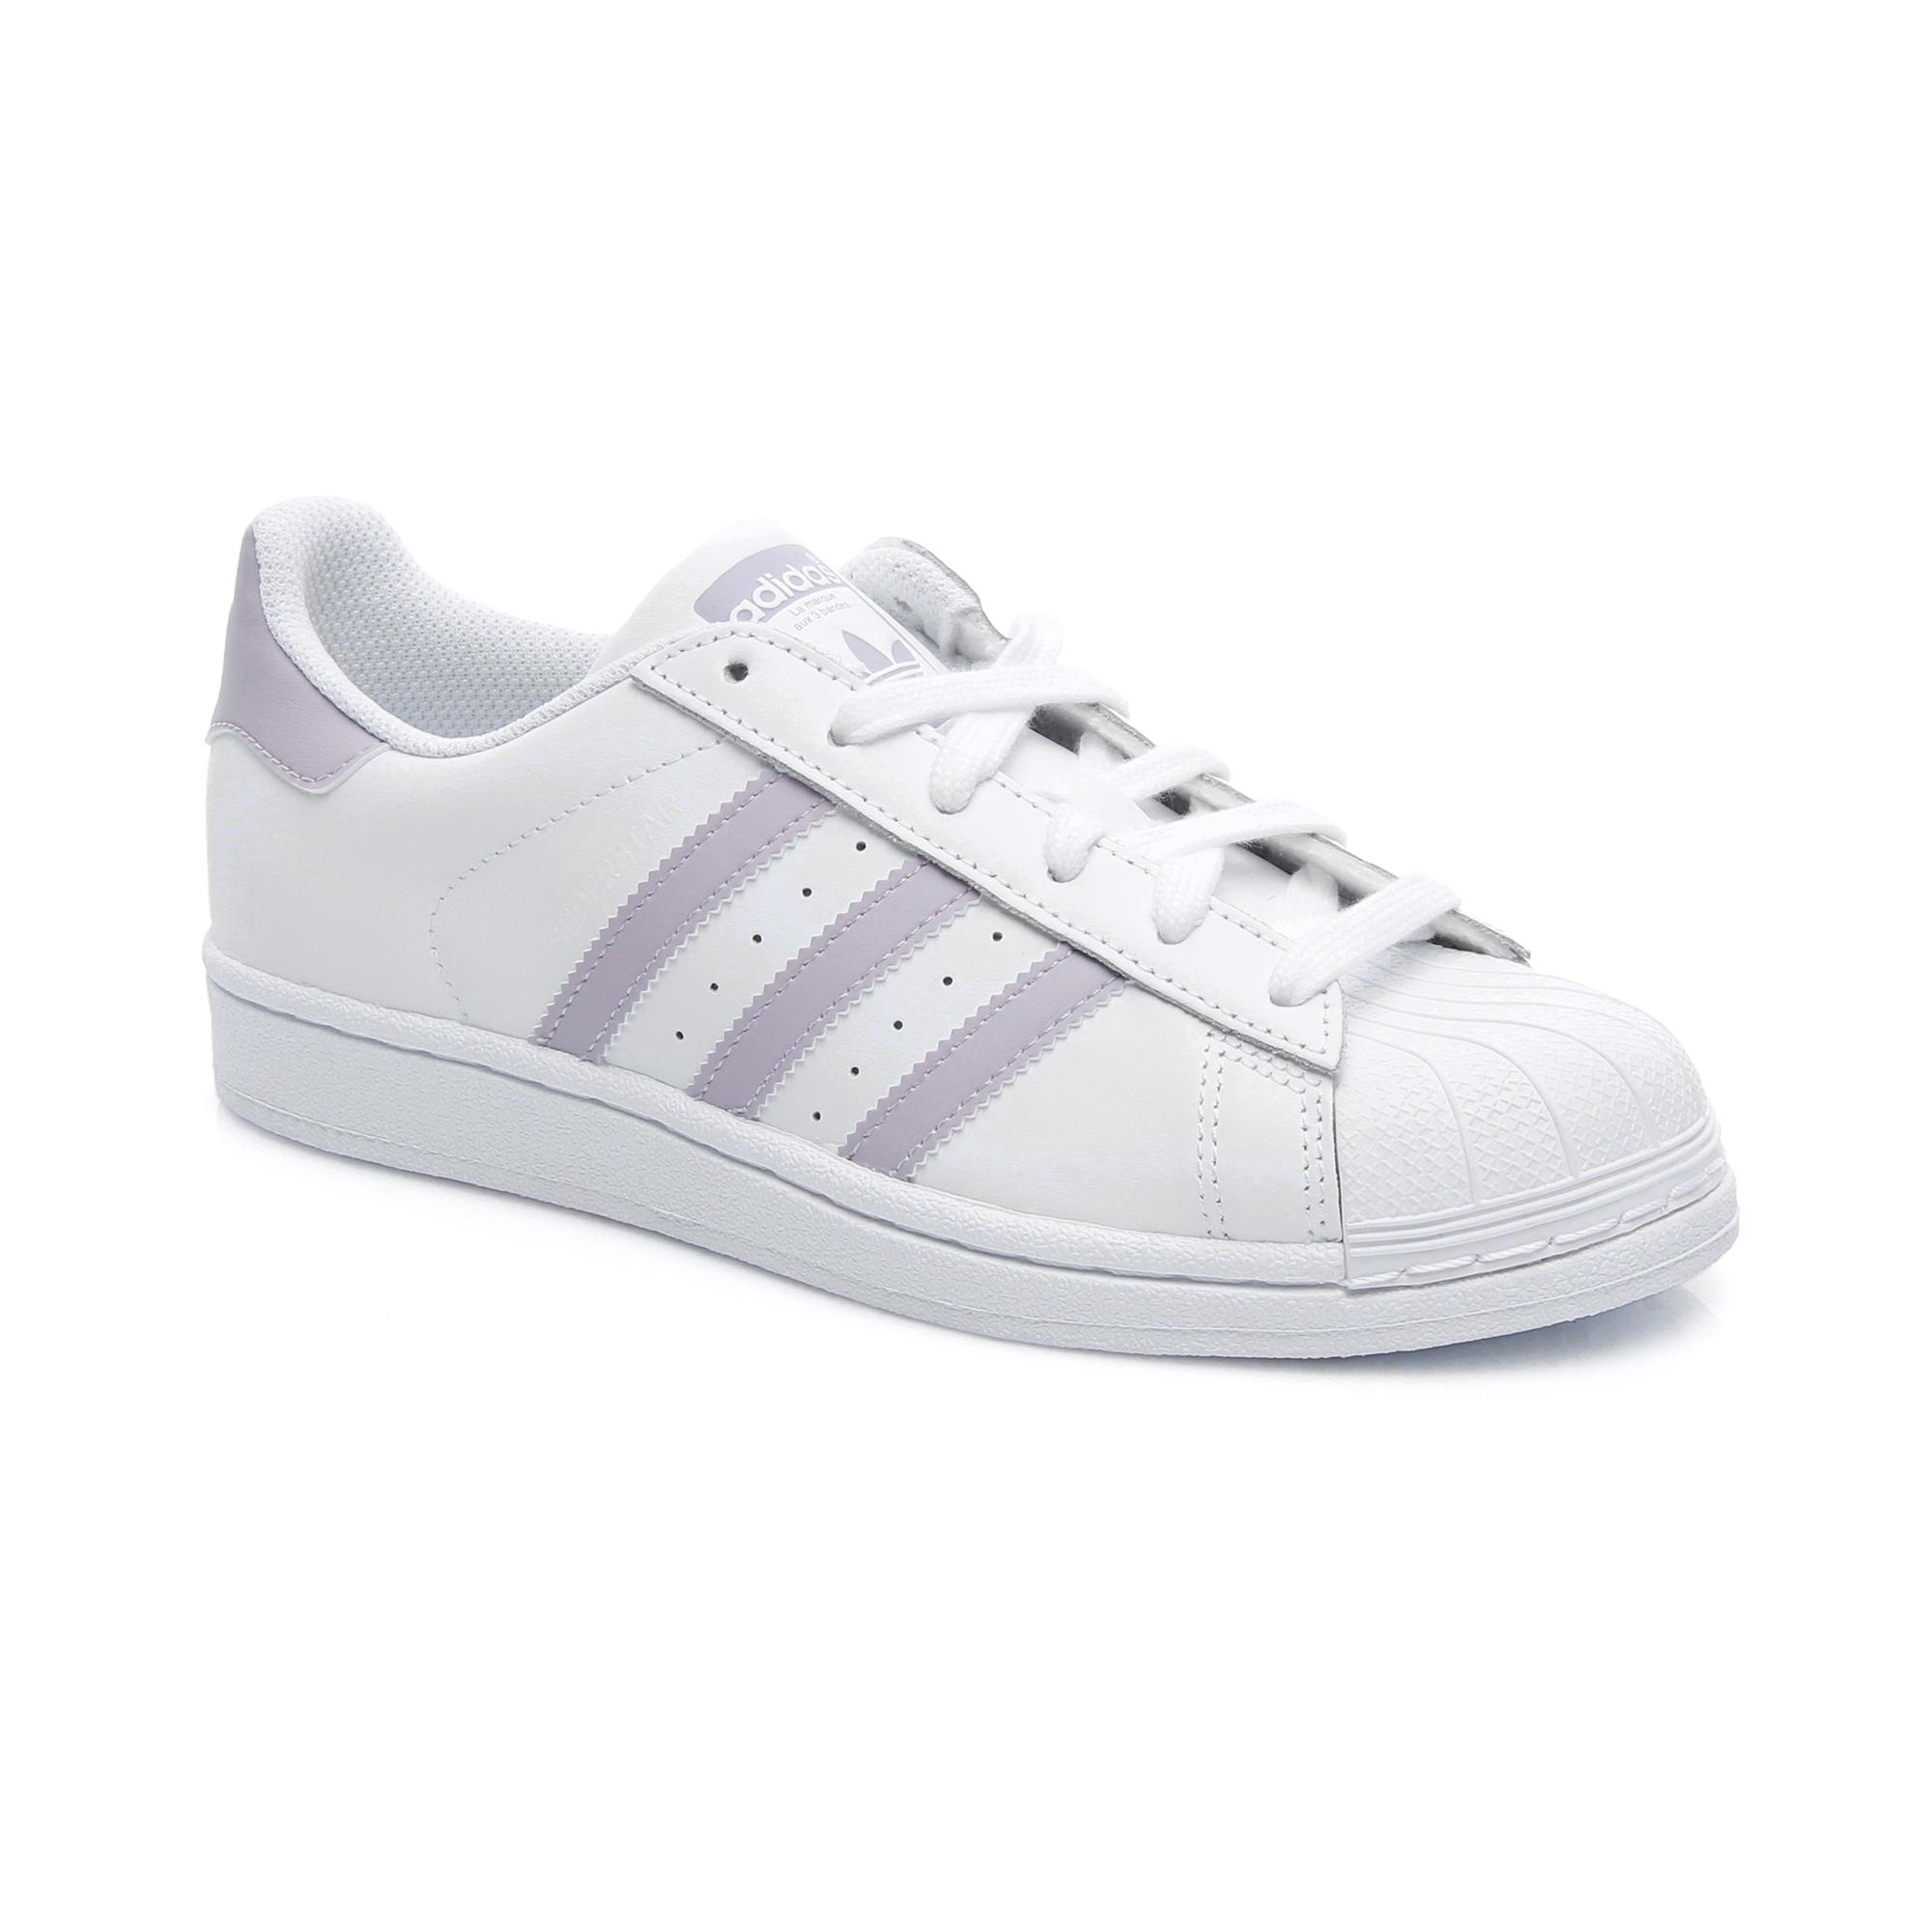 Adidas Originals Superstar Kadın Beyaz Spor Ayakkabı.db3347.-